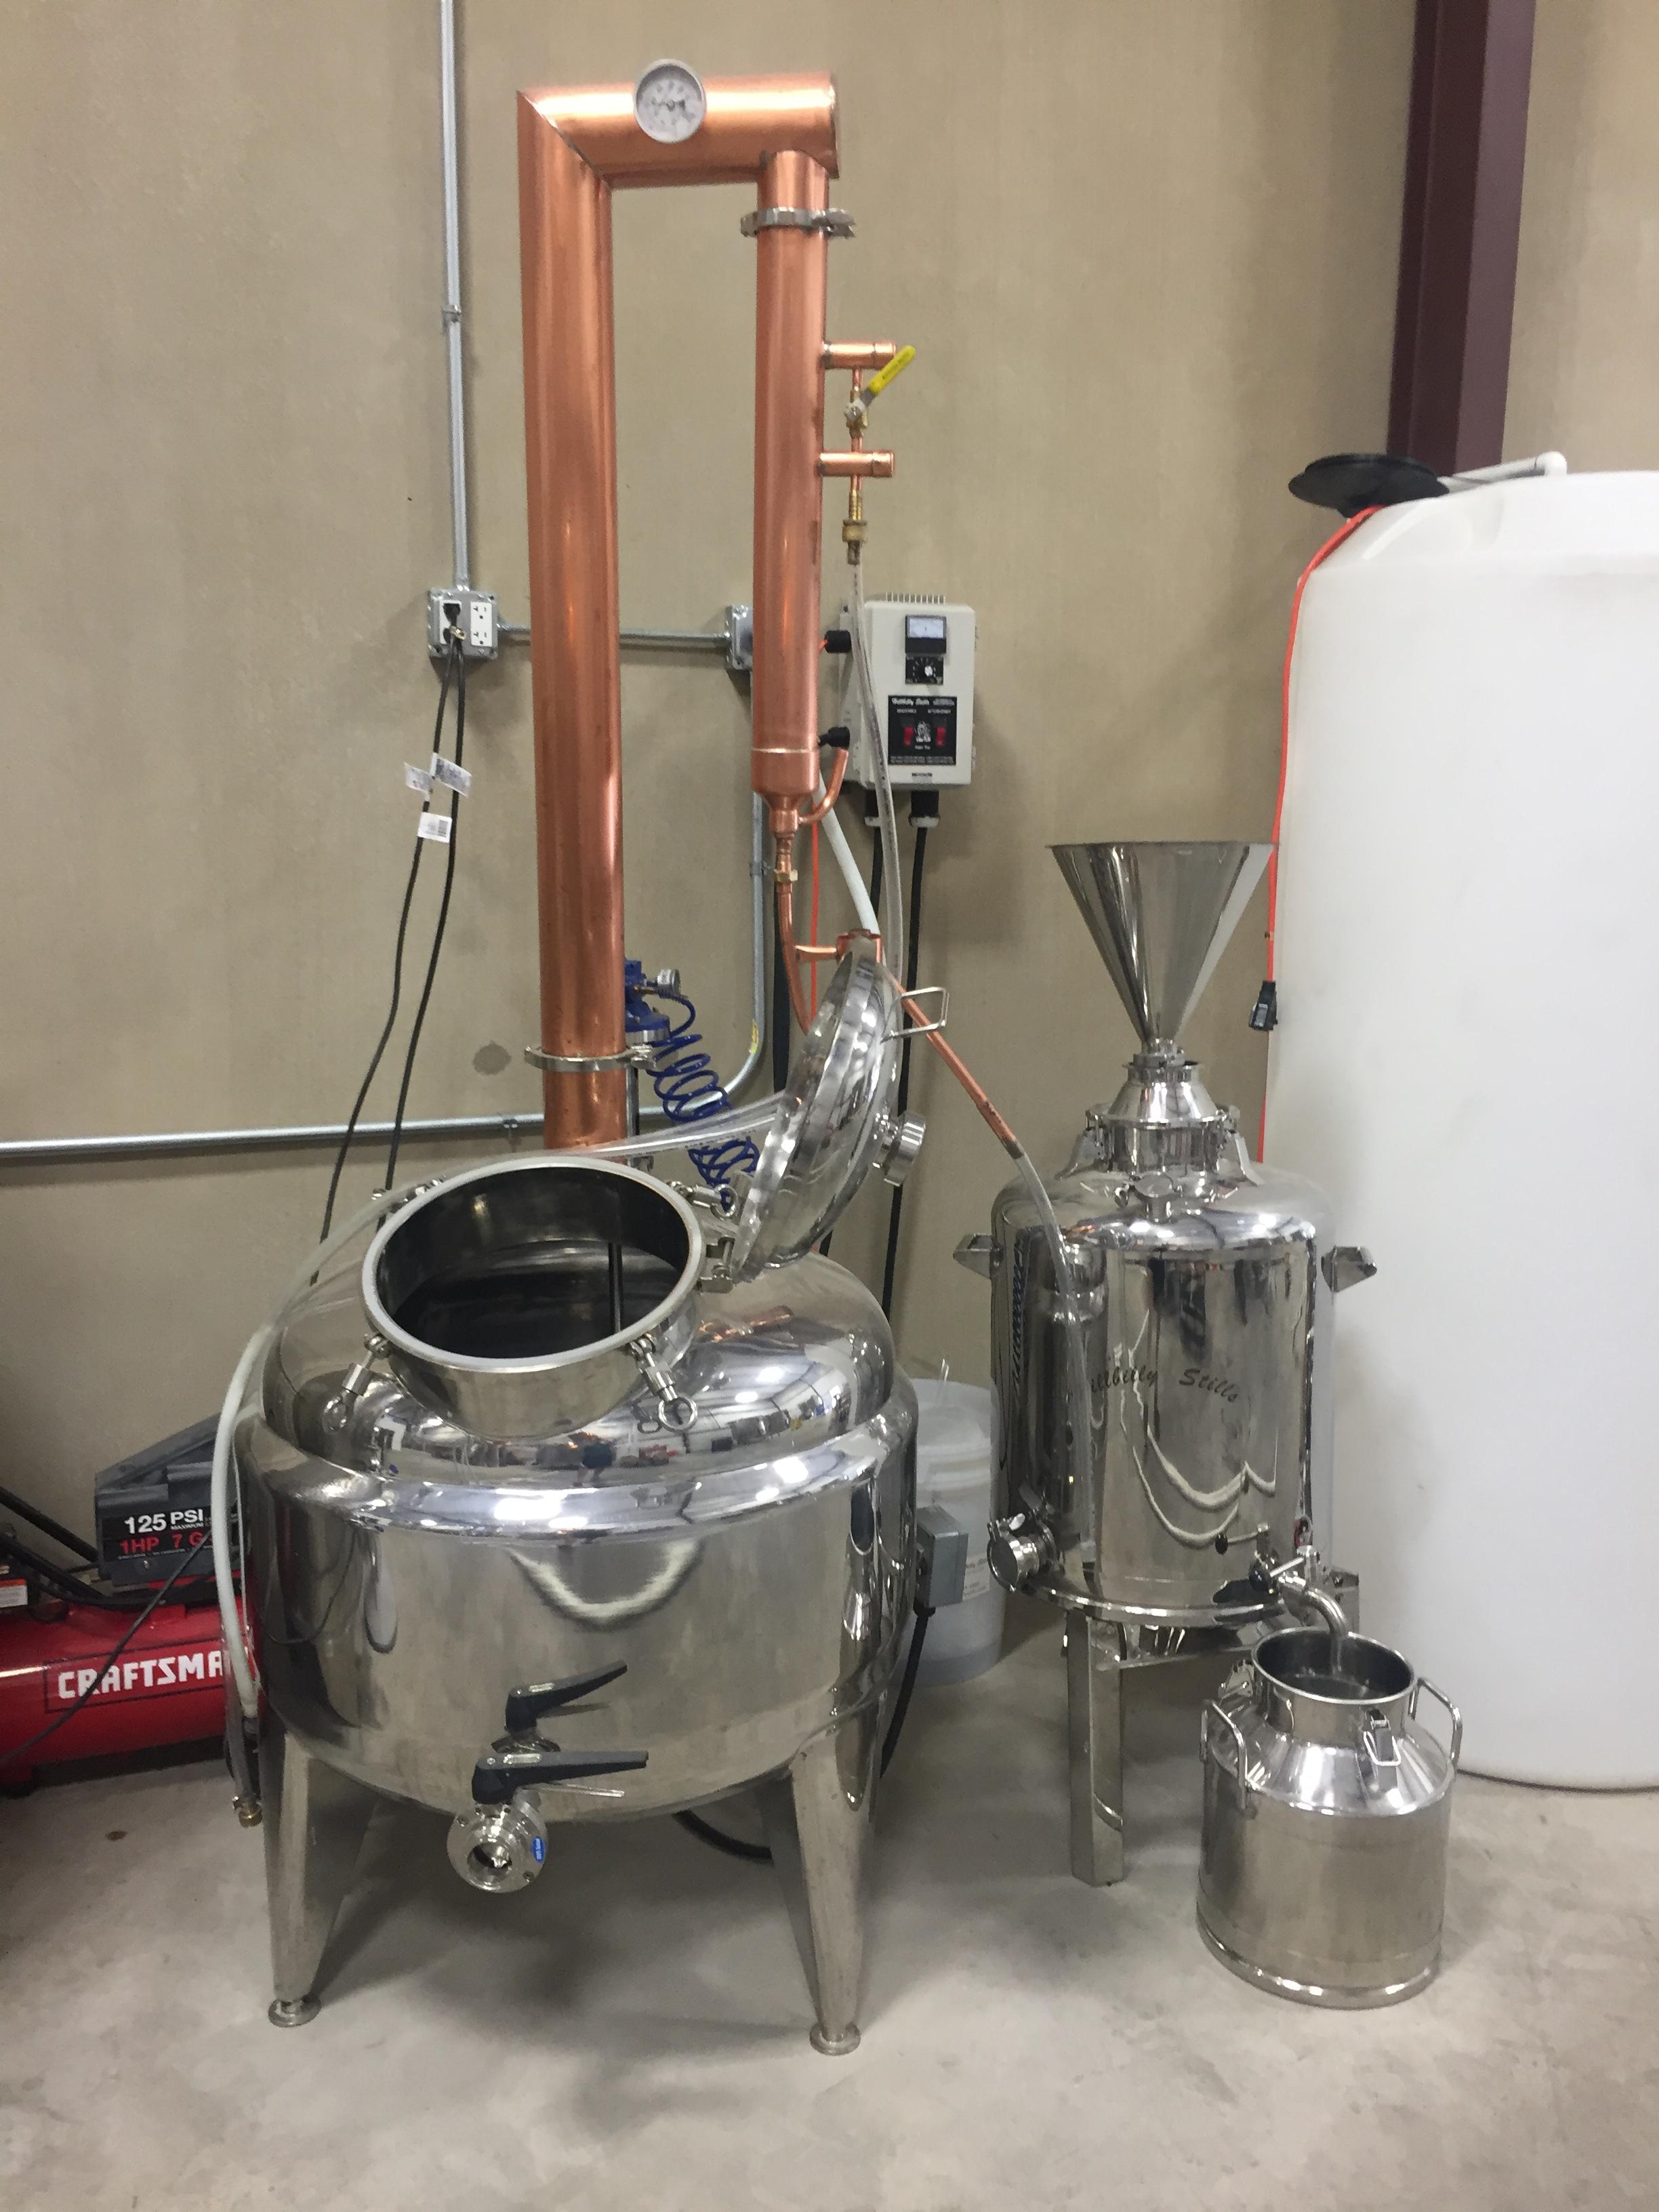 50 gallon used Hillbilly Still for sale - Equipment - ADI Forums